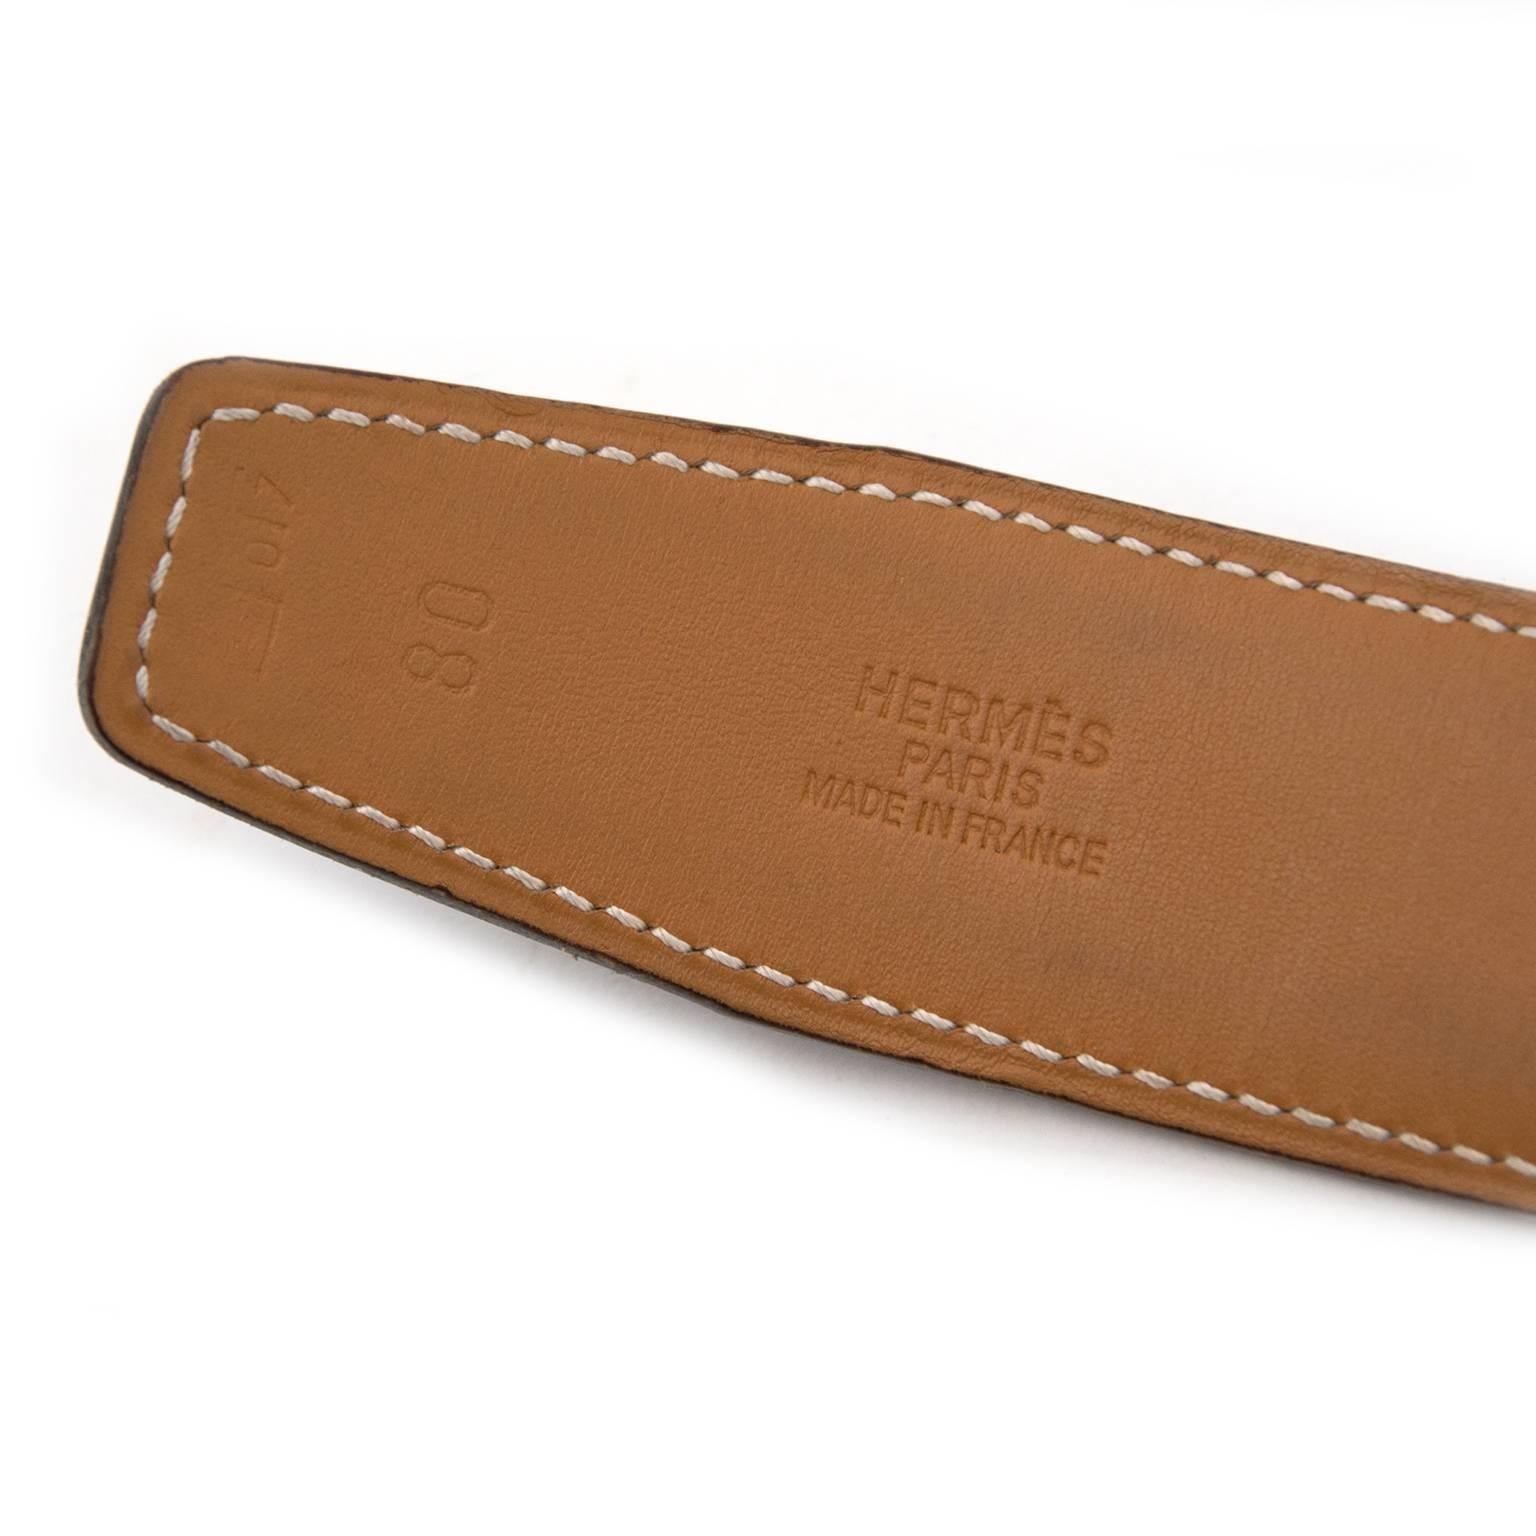 Hermes Belt Original Vs Fake ✓ Shoes Style 2018 c63ba0f9d5